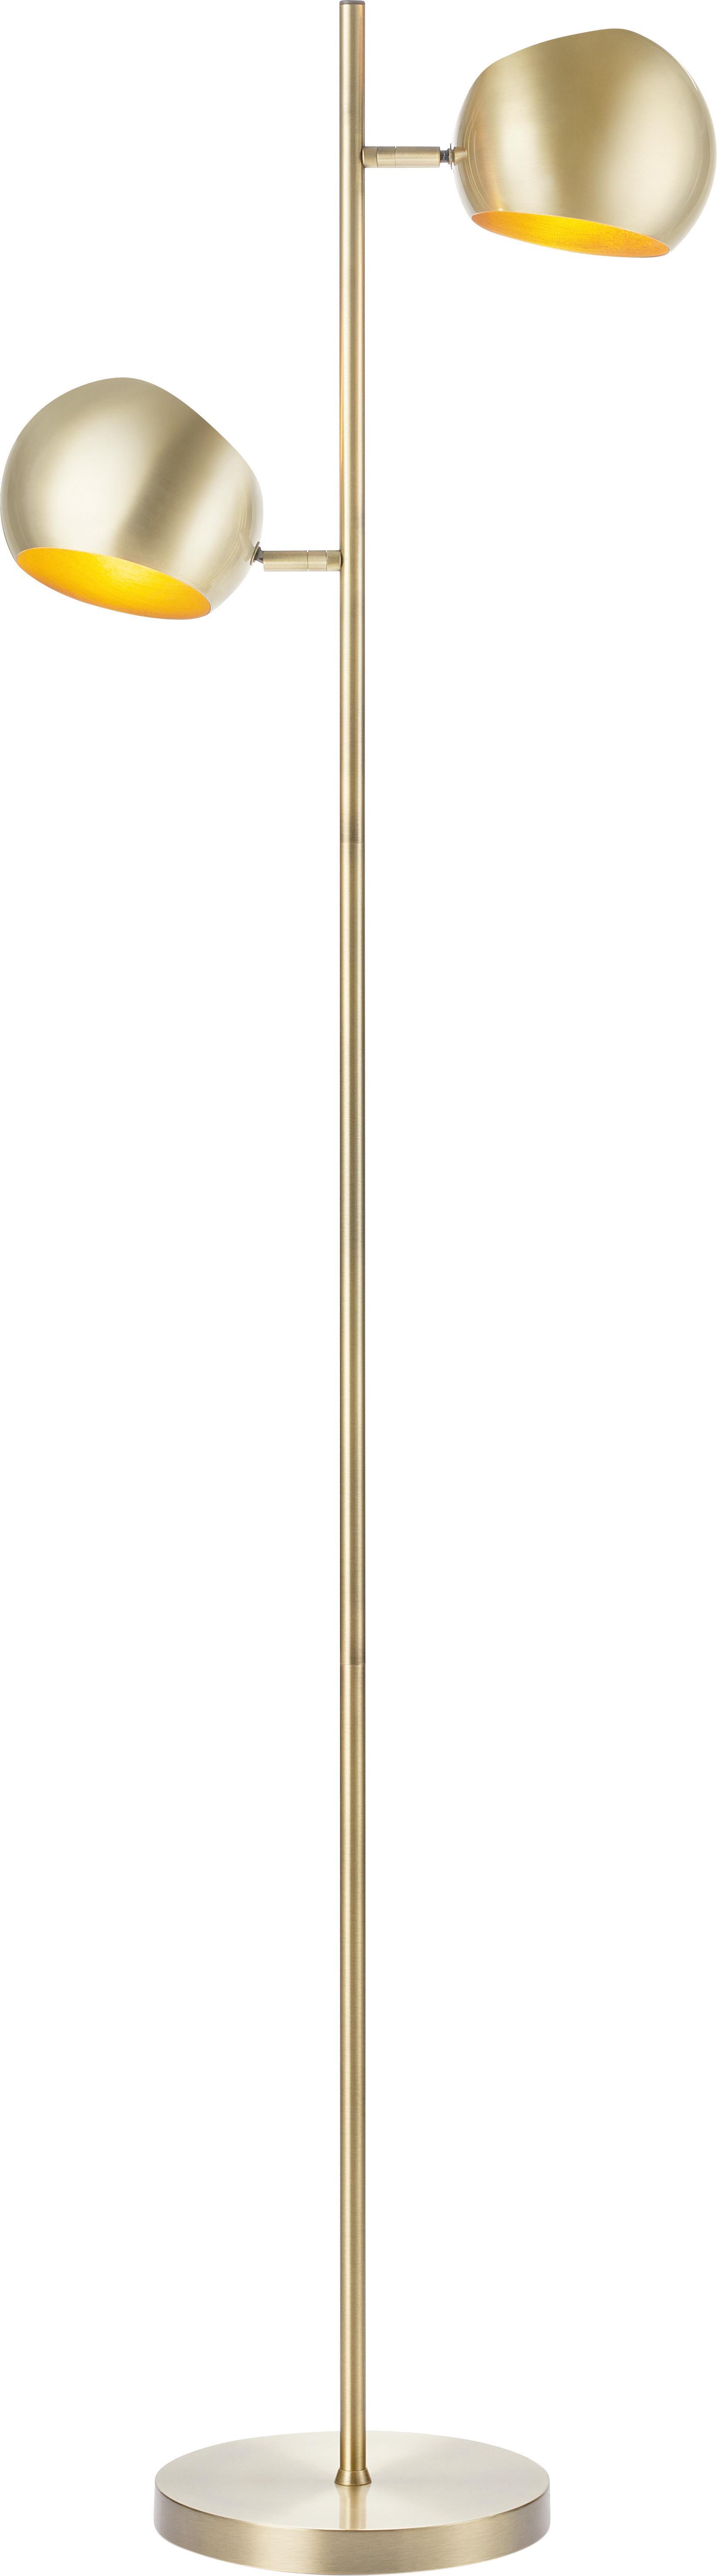 Lampada da terra Edgar, Ottonato con finitura anticata, Larg. 40 x Alt. 145 cm